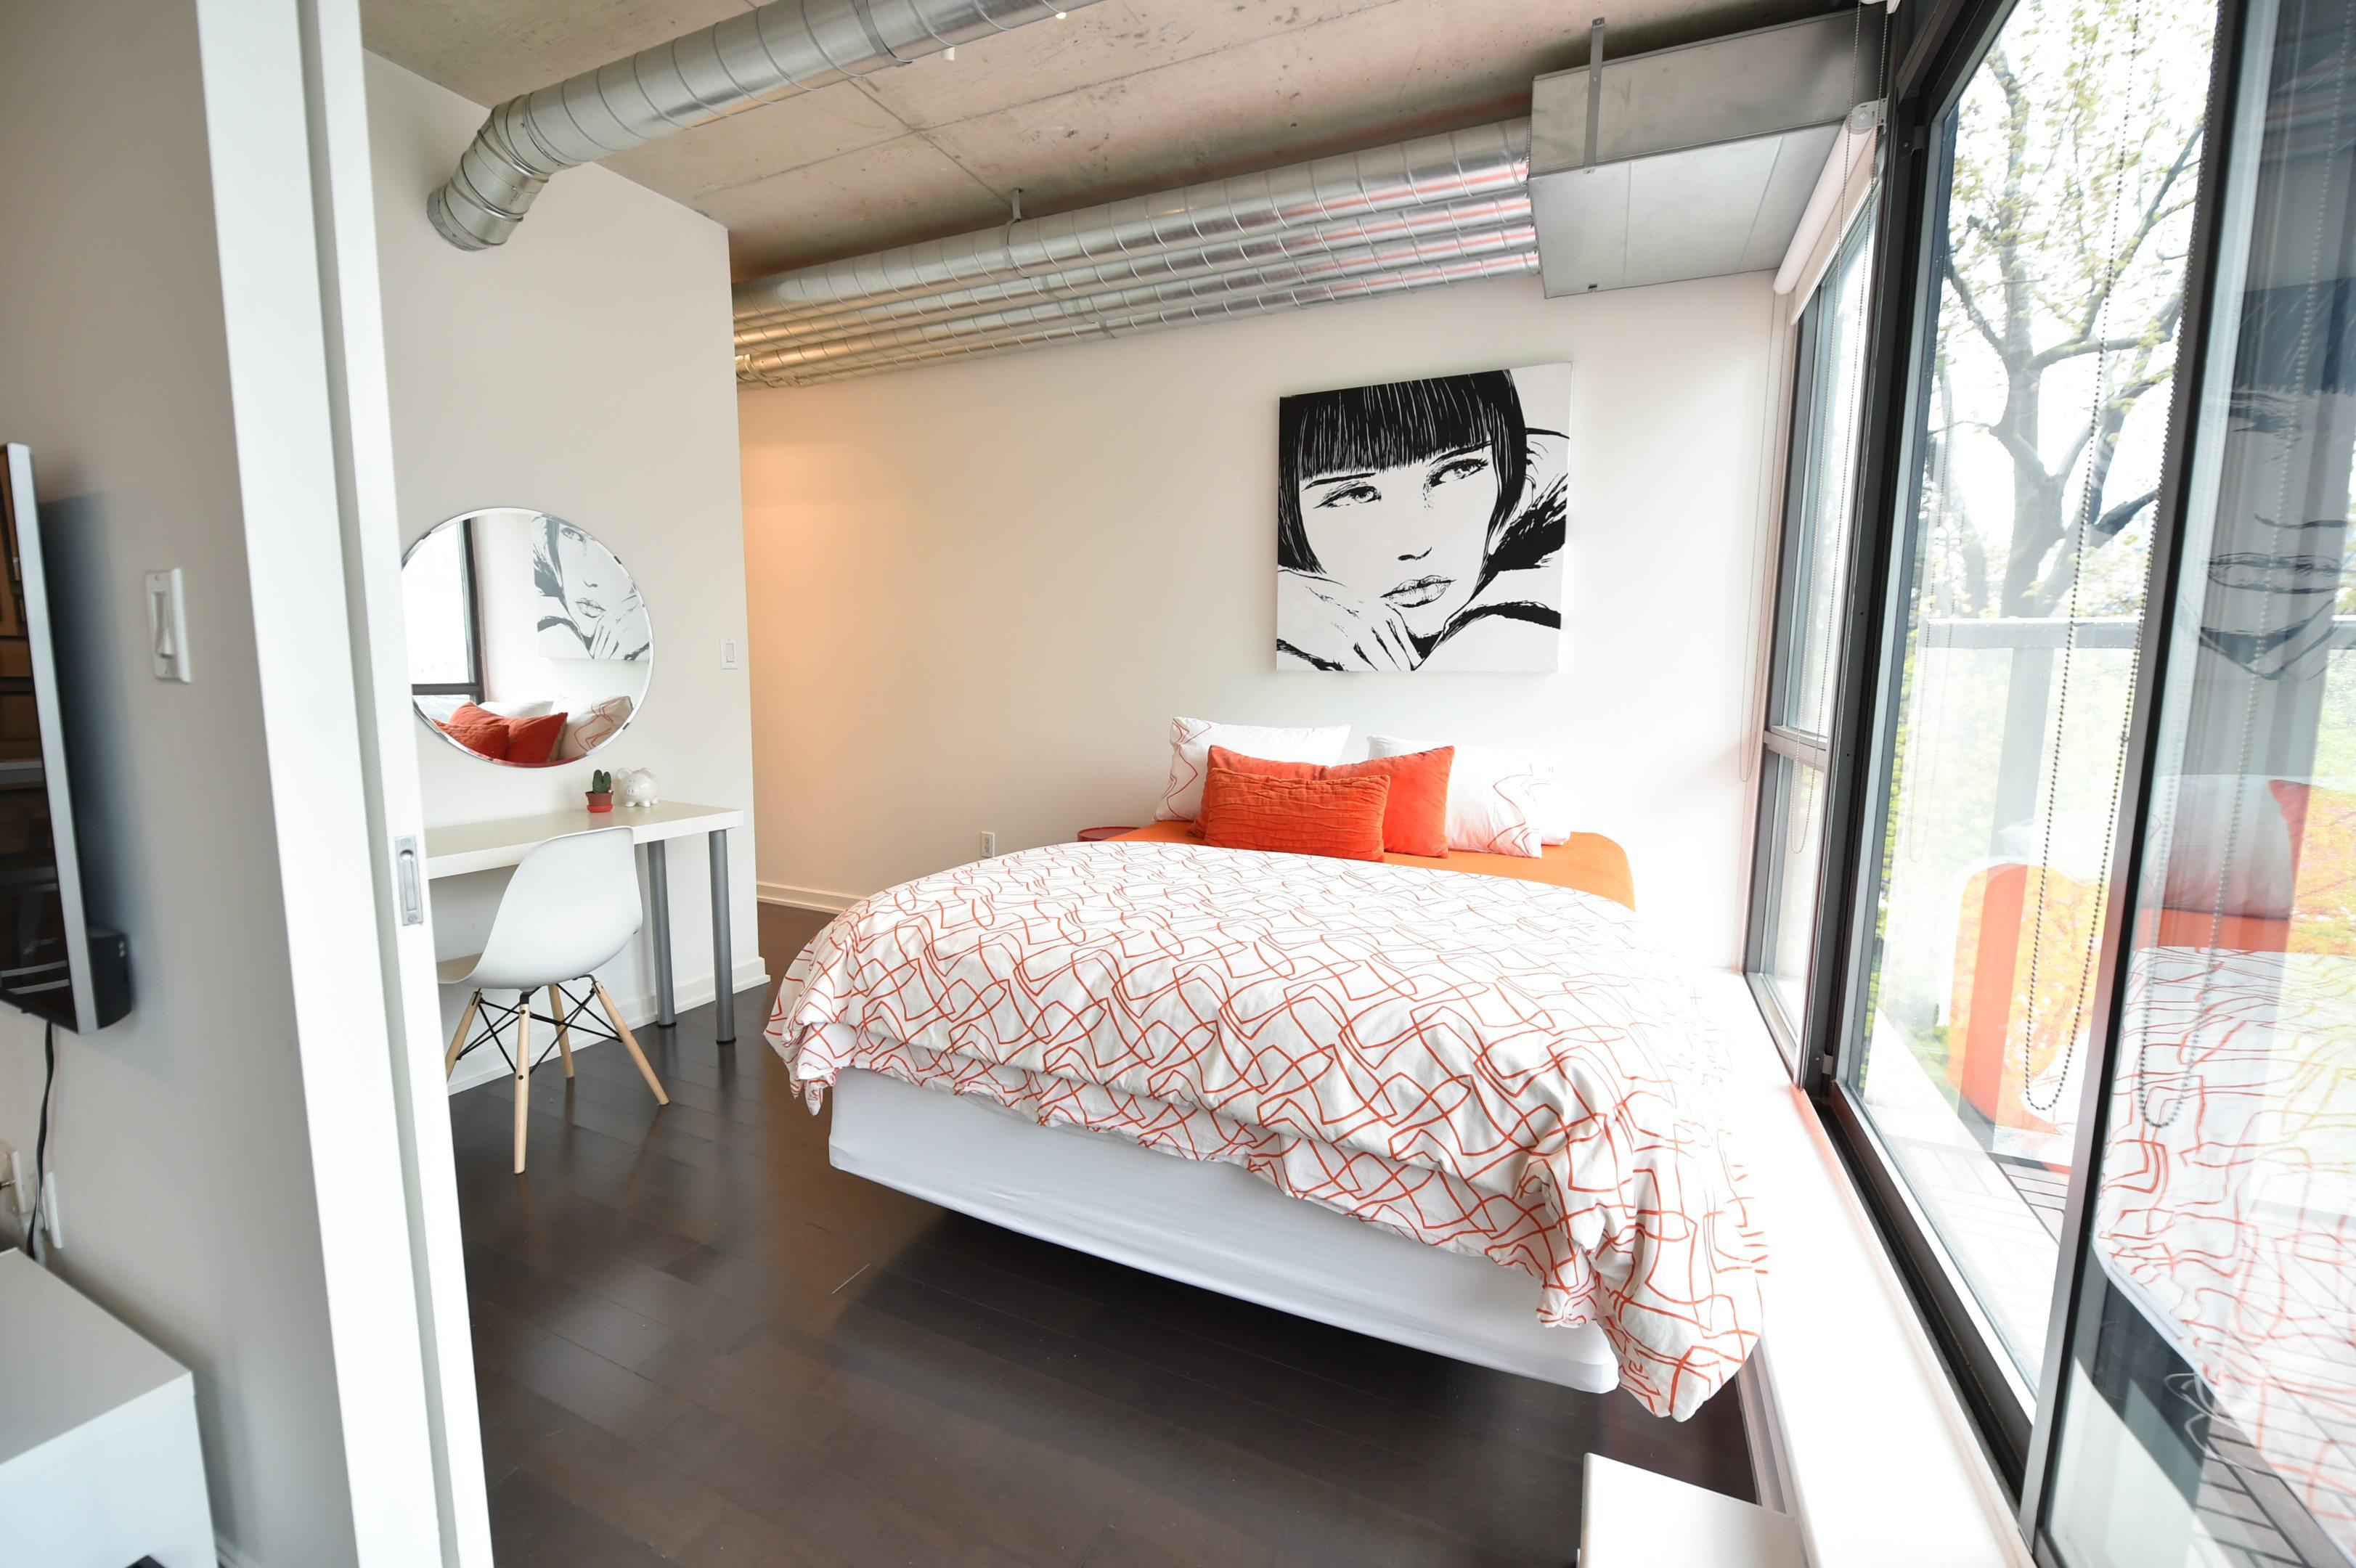 toronto-apartment-for-rent-533-richmond-street-west-3